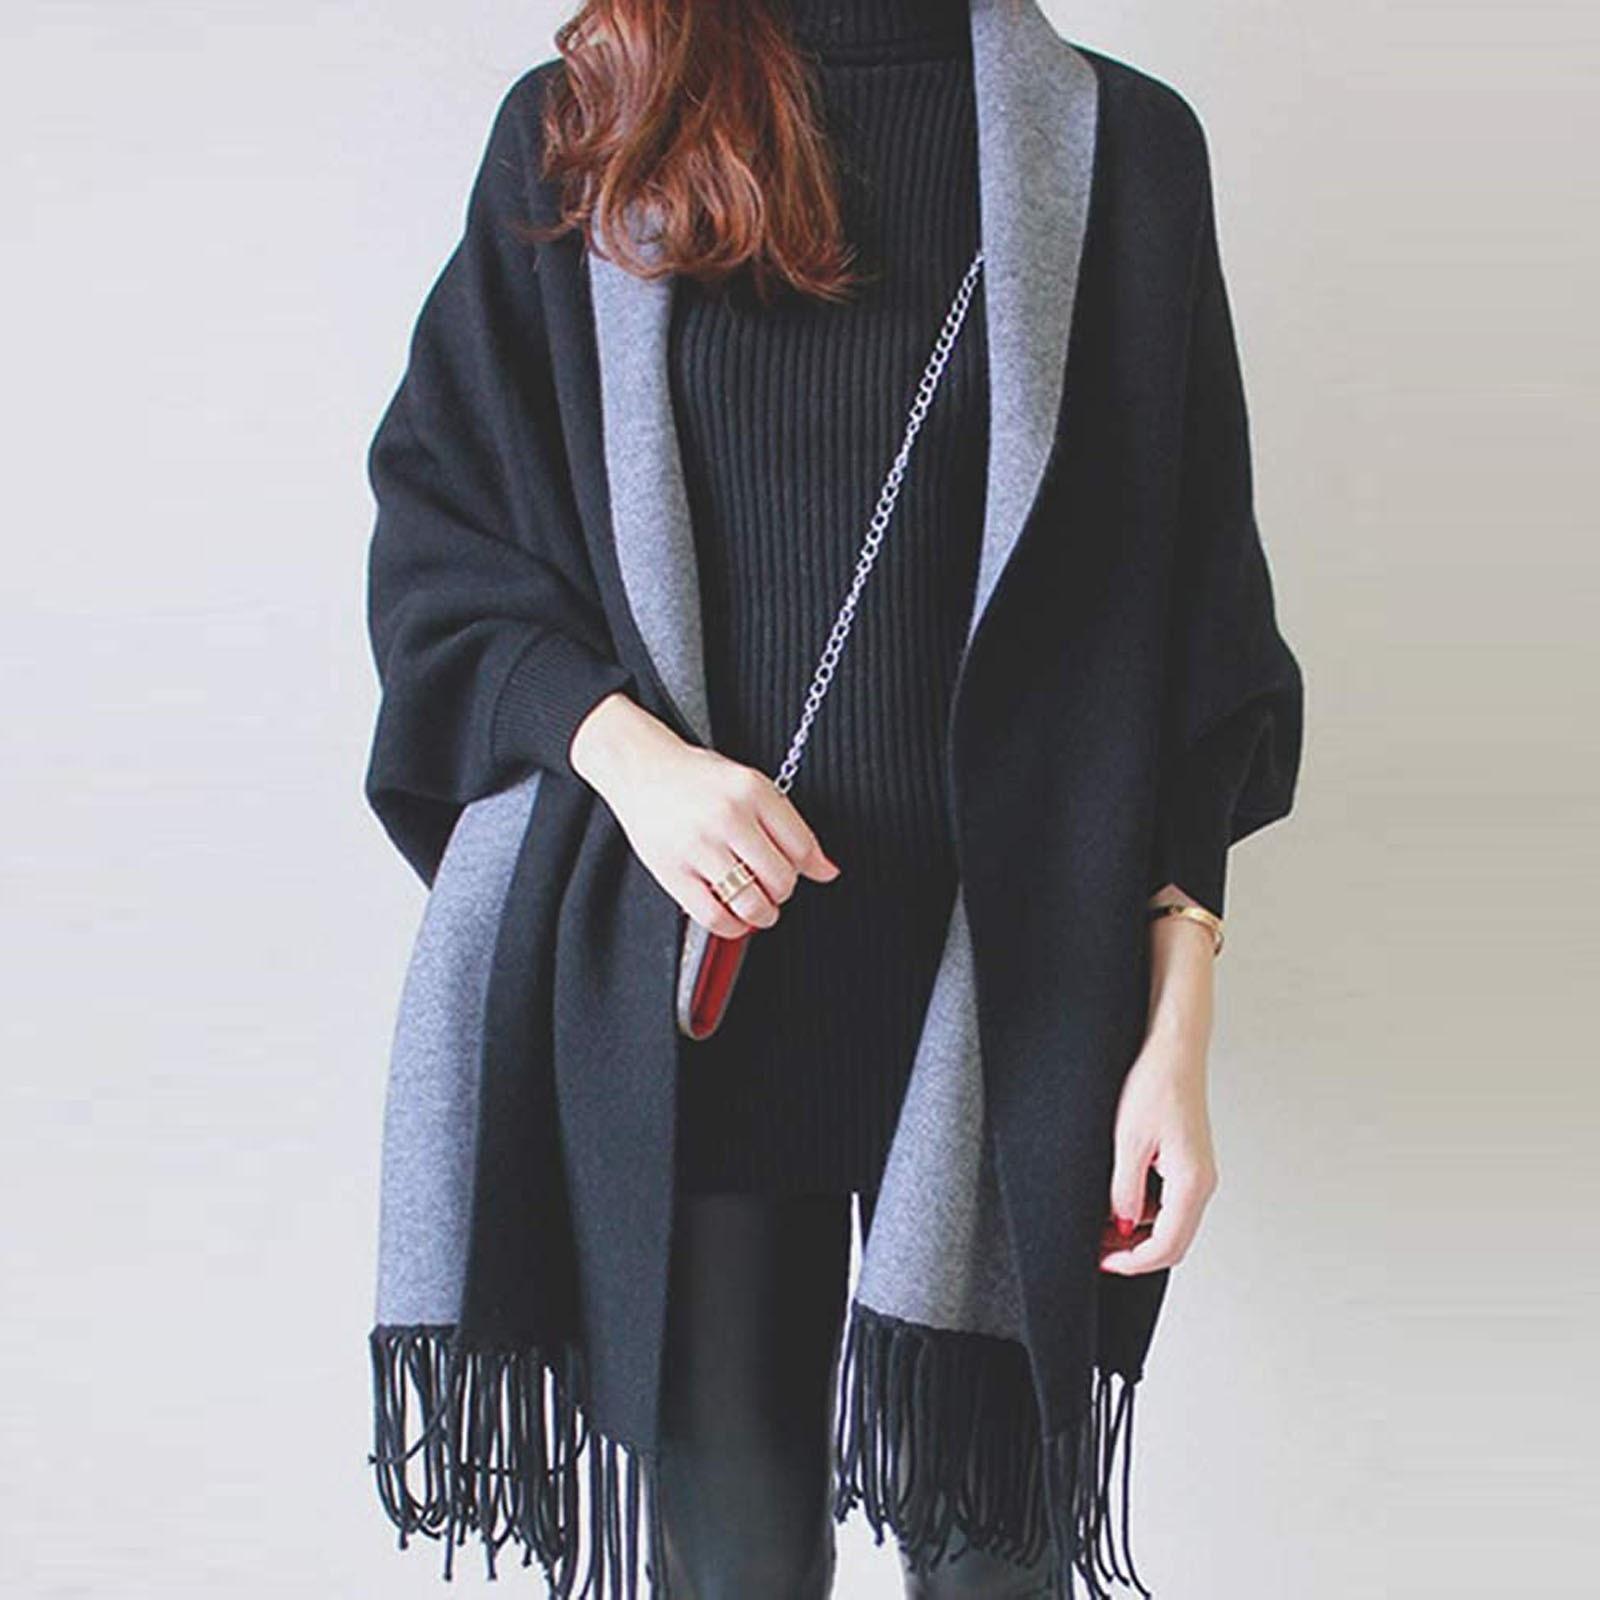 4# Fashion Women Scarf Casual Solid Tassel Retro Double Sided Scarf Wrap Shawl Holiday Commuting Warmer Scarves шарфы женские